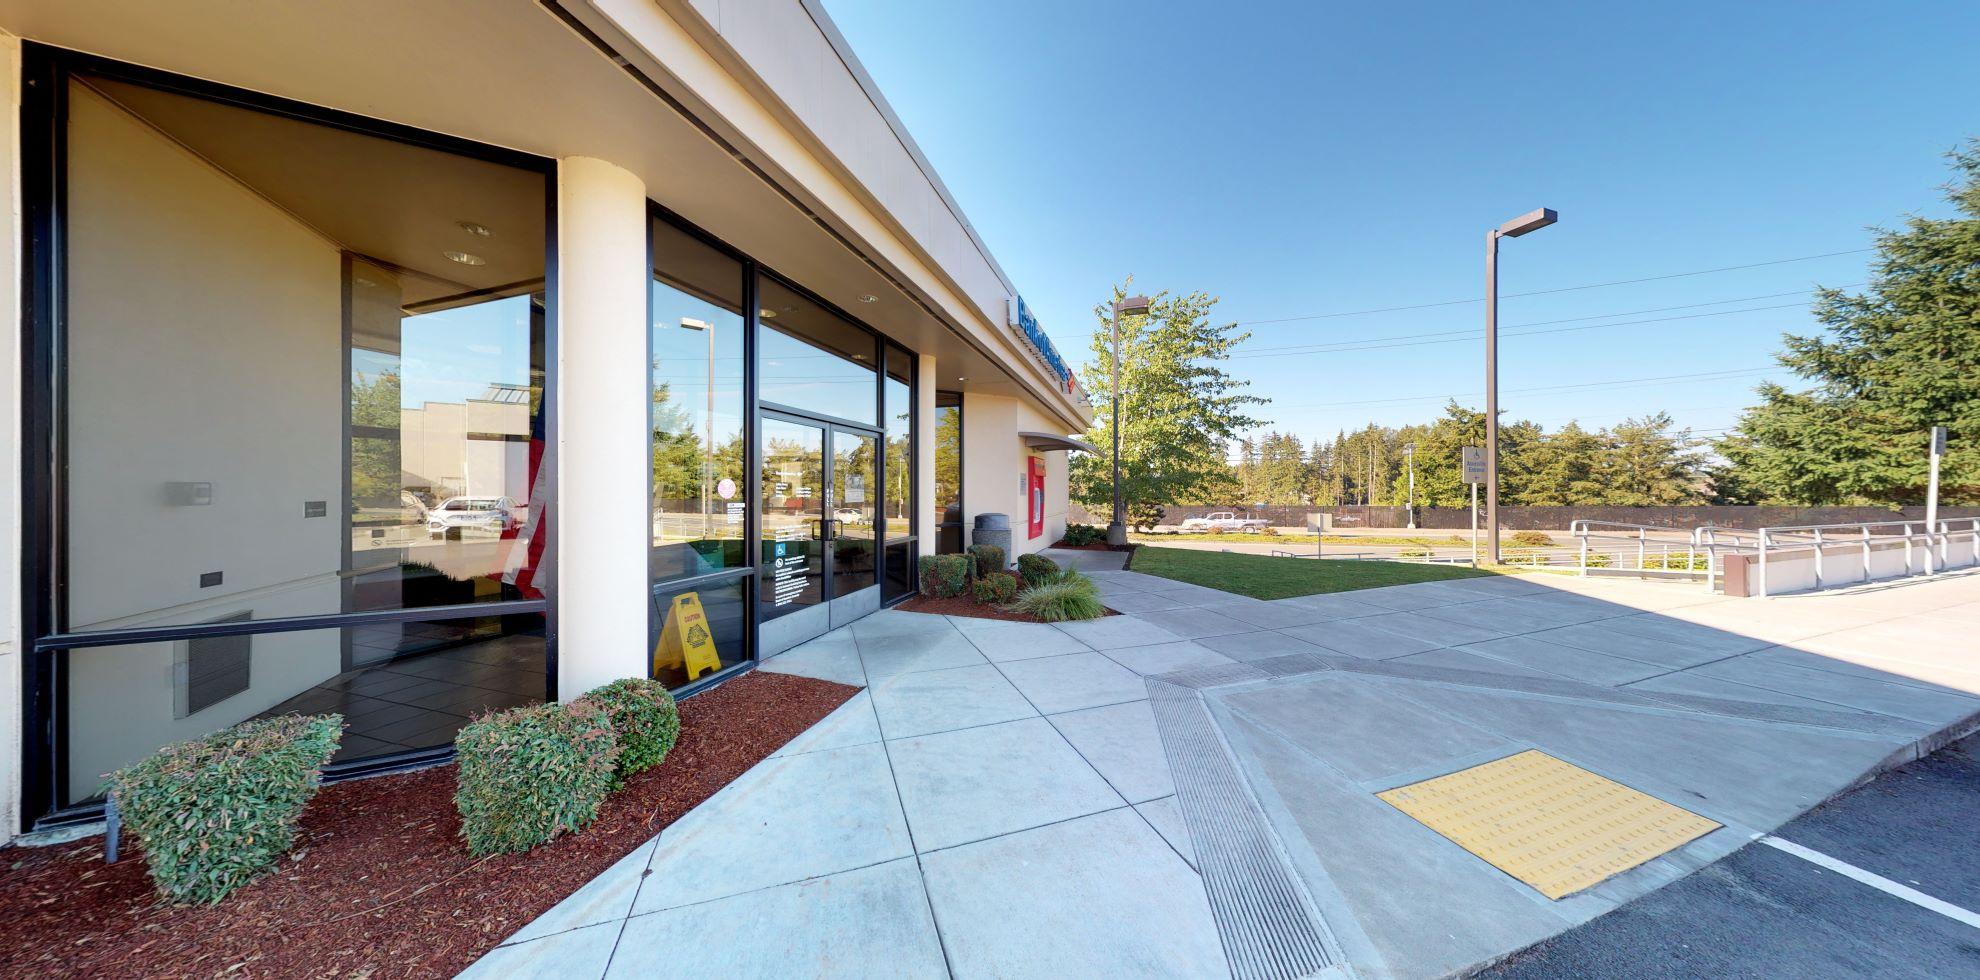 Bank of America financial center with drive-thru ATM | 3090 Issaquah Pine Lake Rd SE, Sammamish, WA 98075